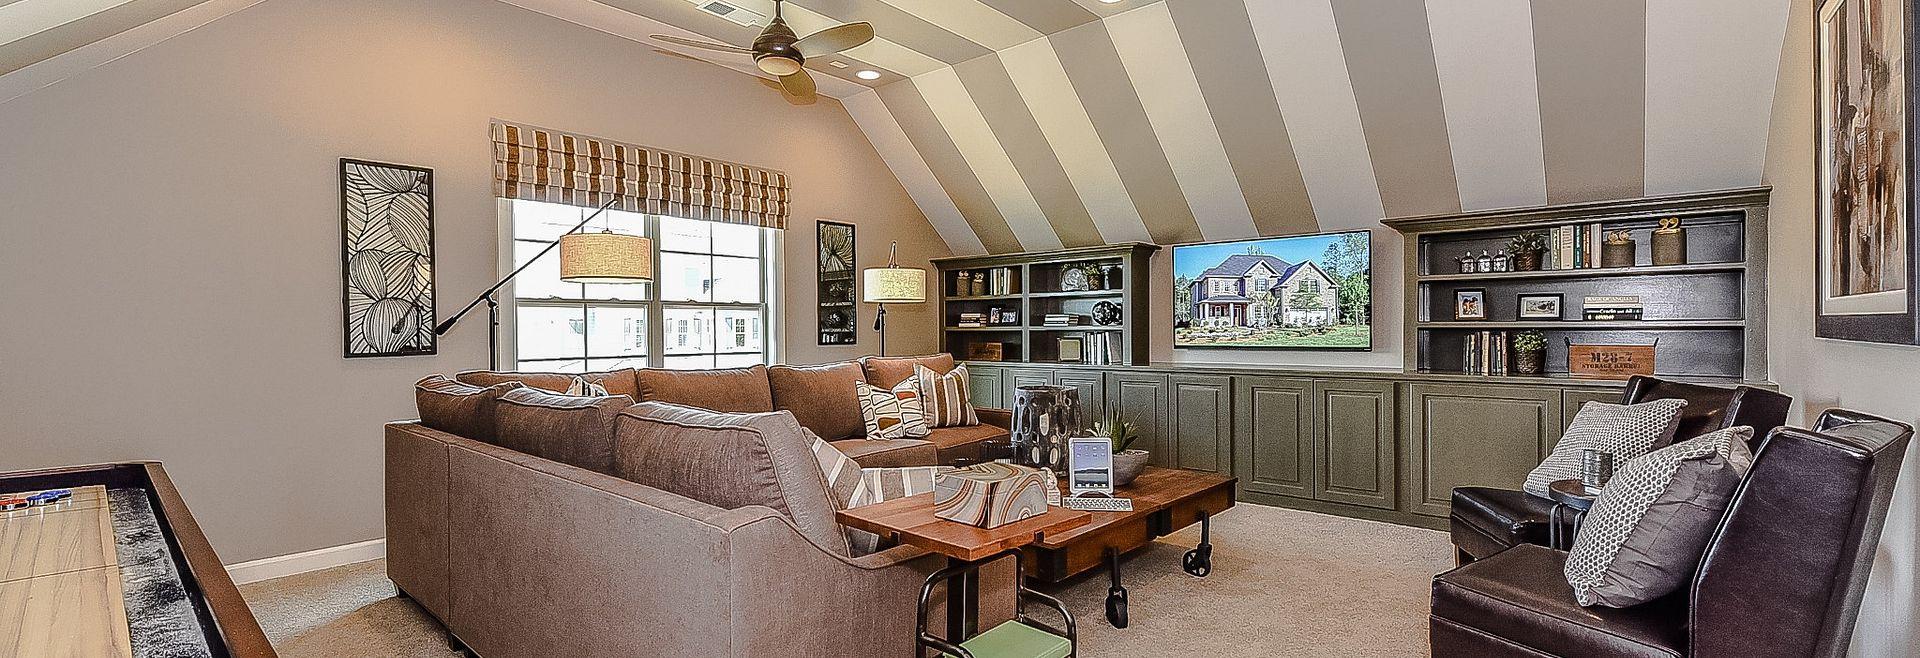 Hampton Bonus Room (example image)